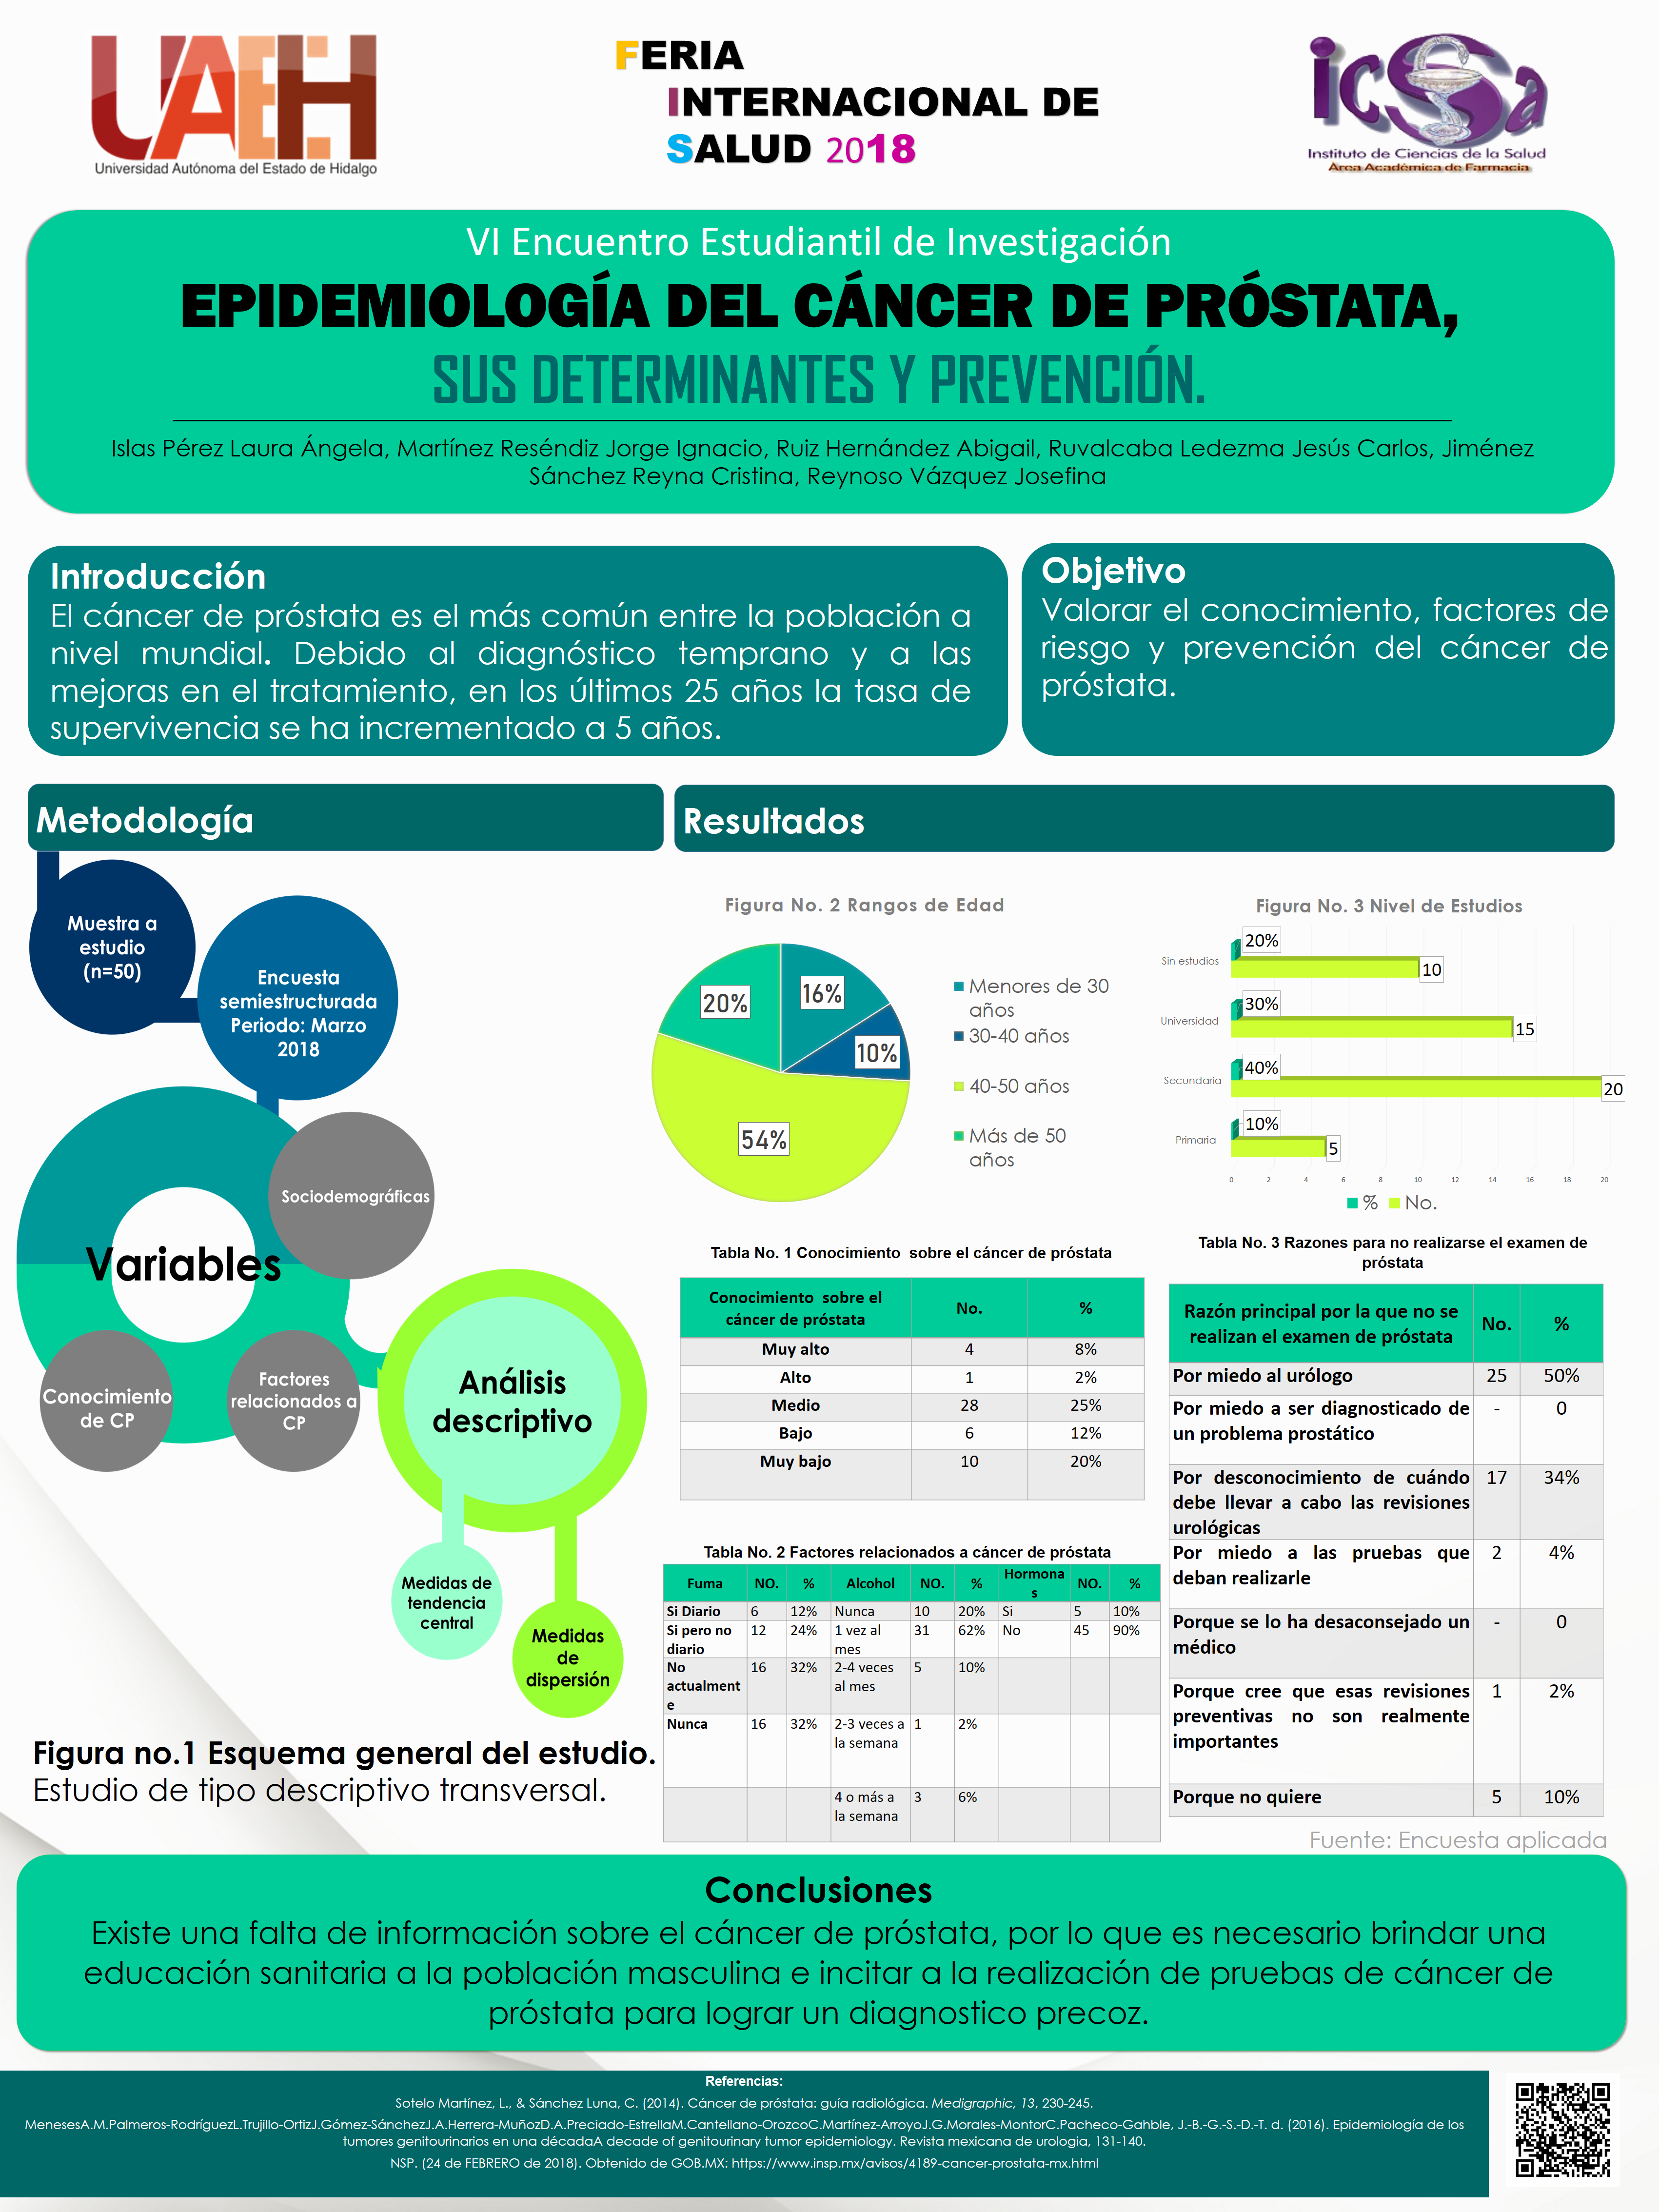 cancer de prostata recidivante